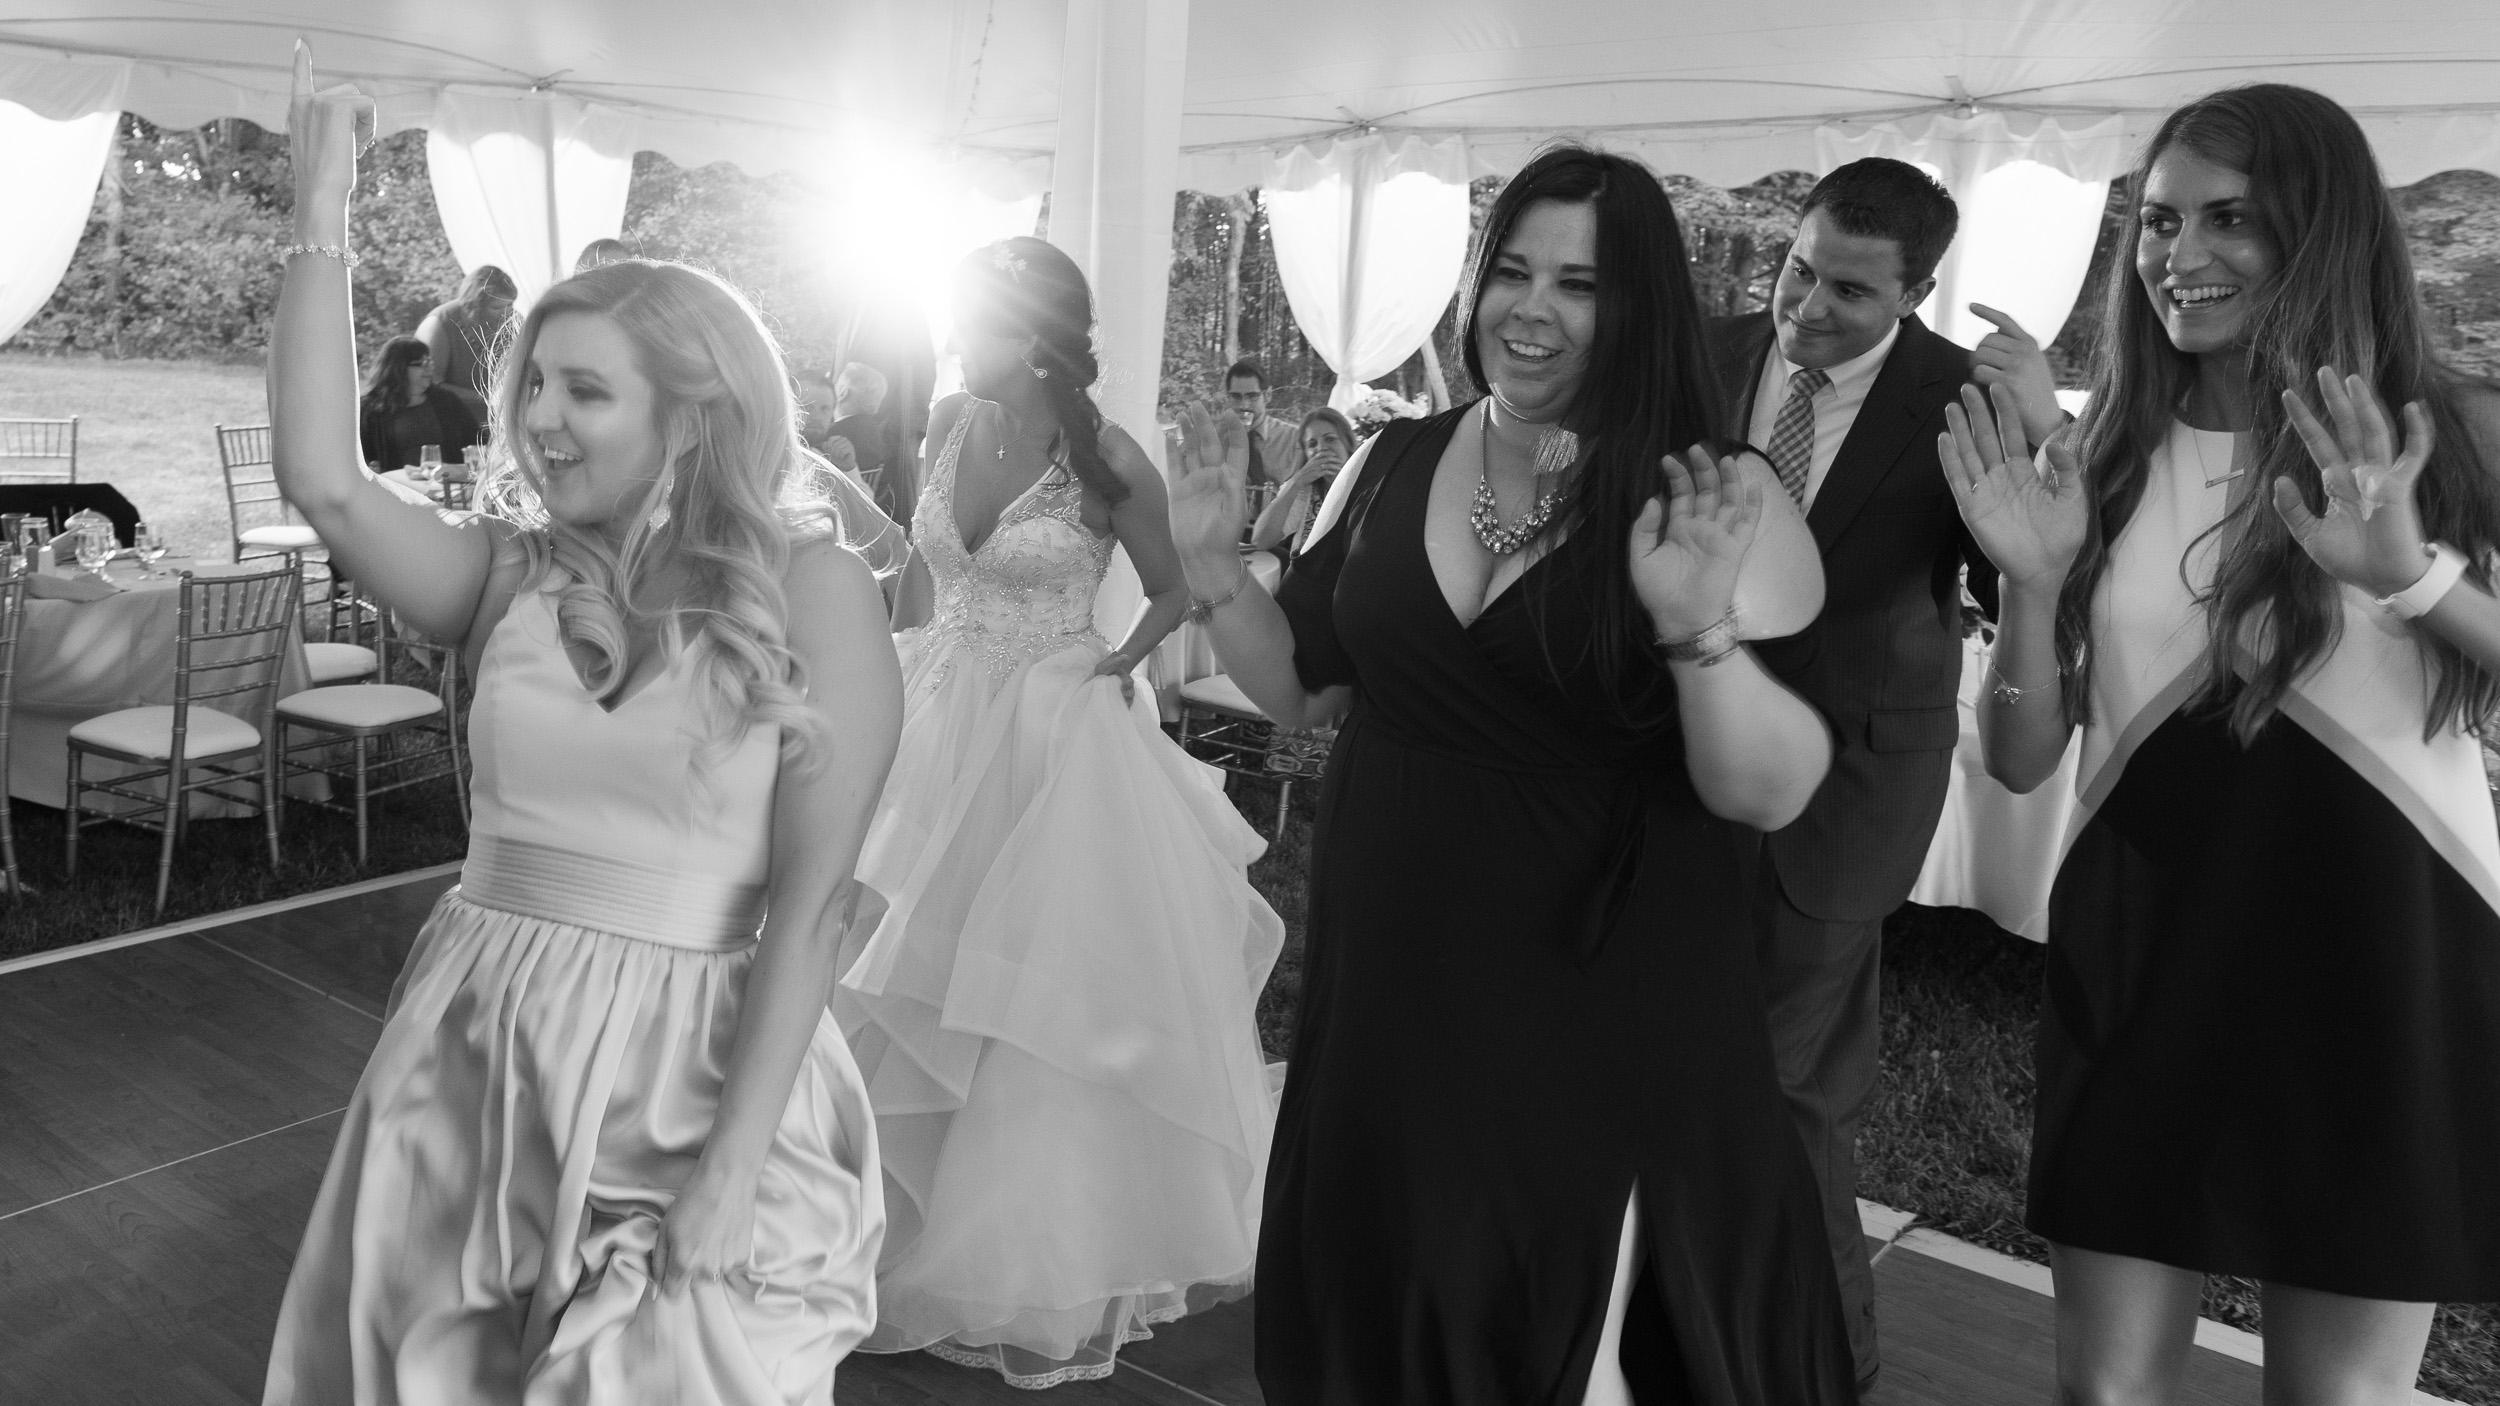 dancing-at-wedding-reception.jpg